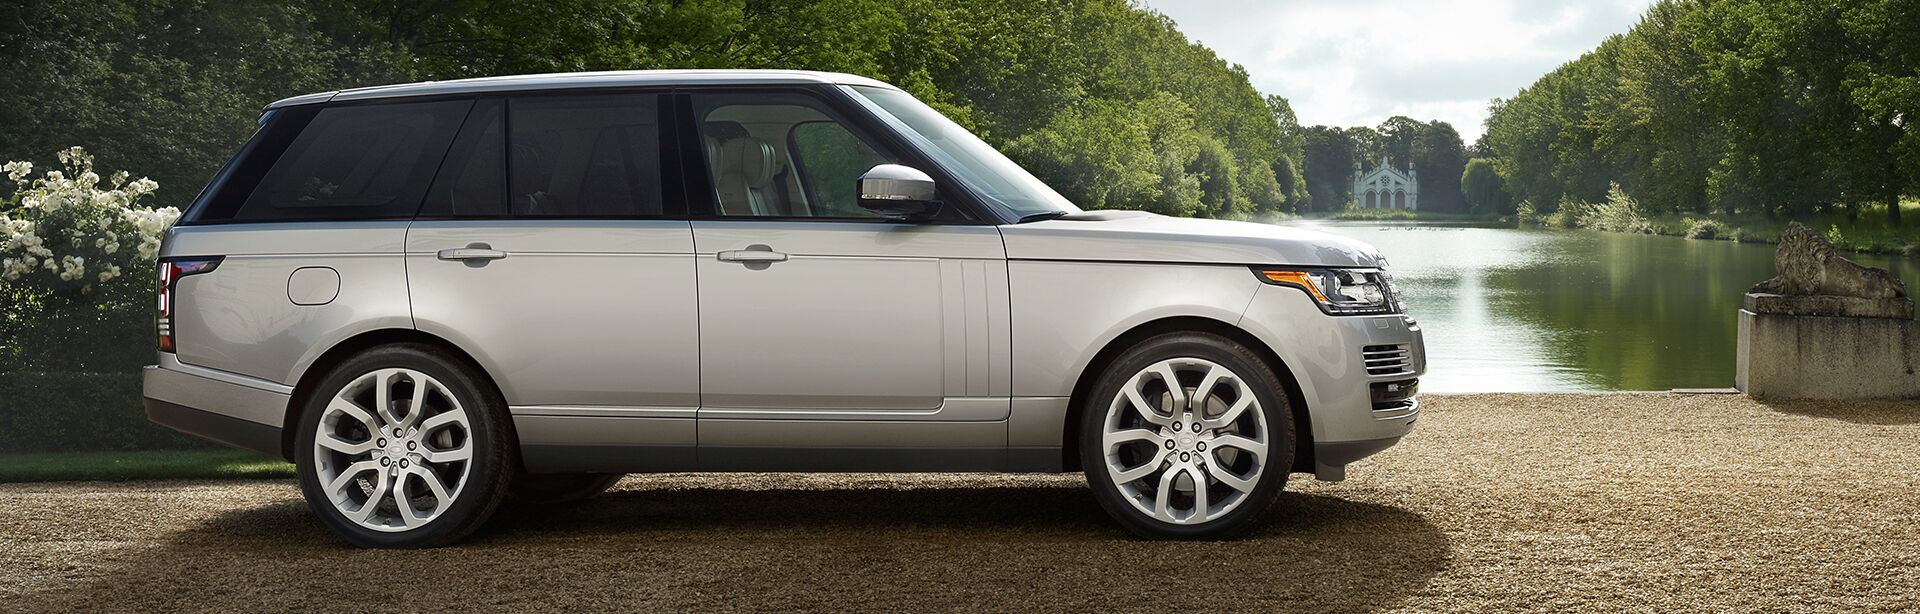 2017 Land Rover Range Rover Td6 Diesel SWB